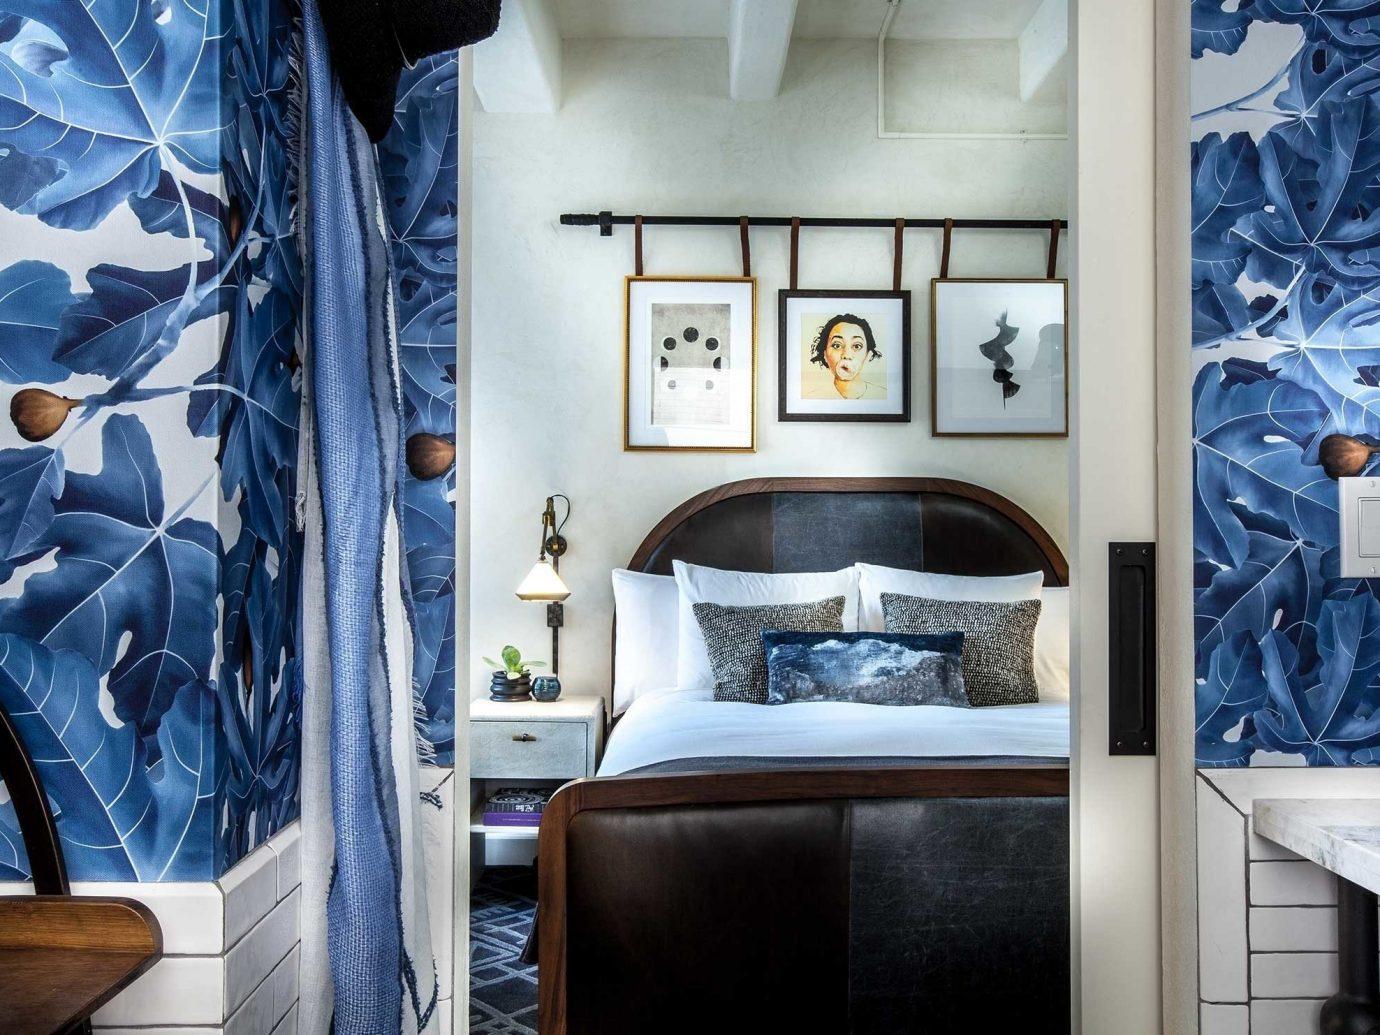 Bedroom at Hotel Figueroa